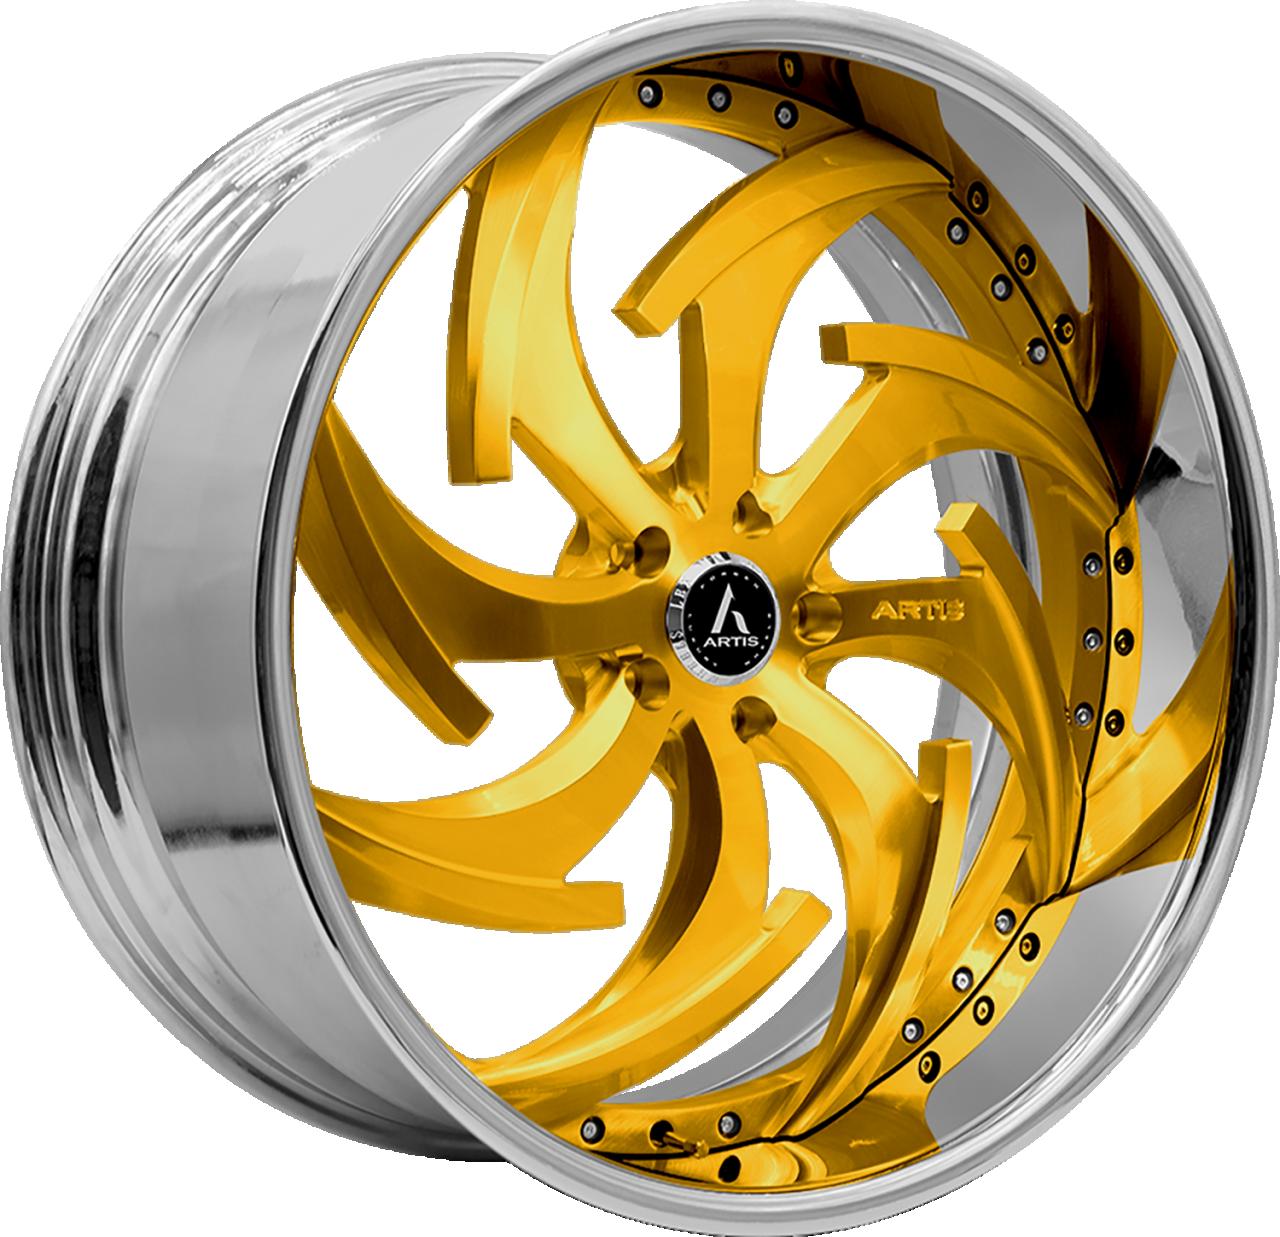 Artis Forged Dagger wheel with Custom Gold finish